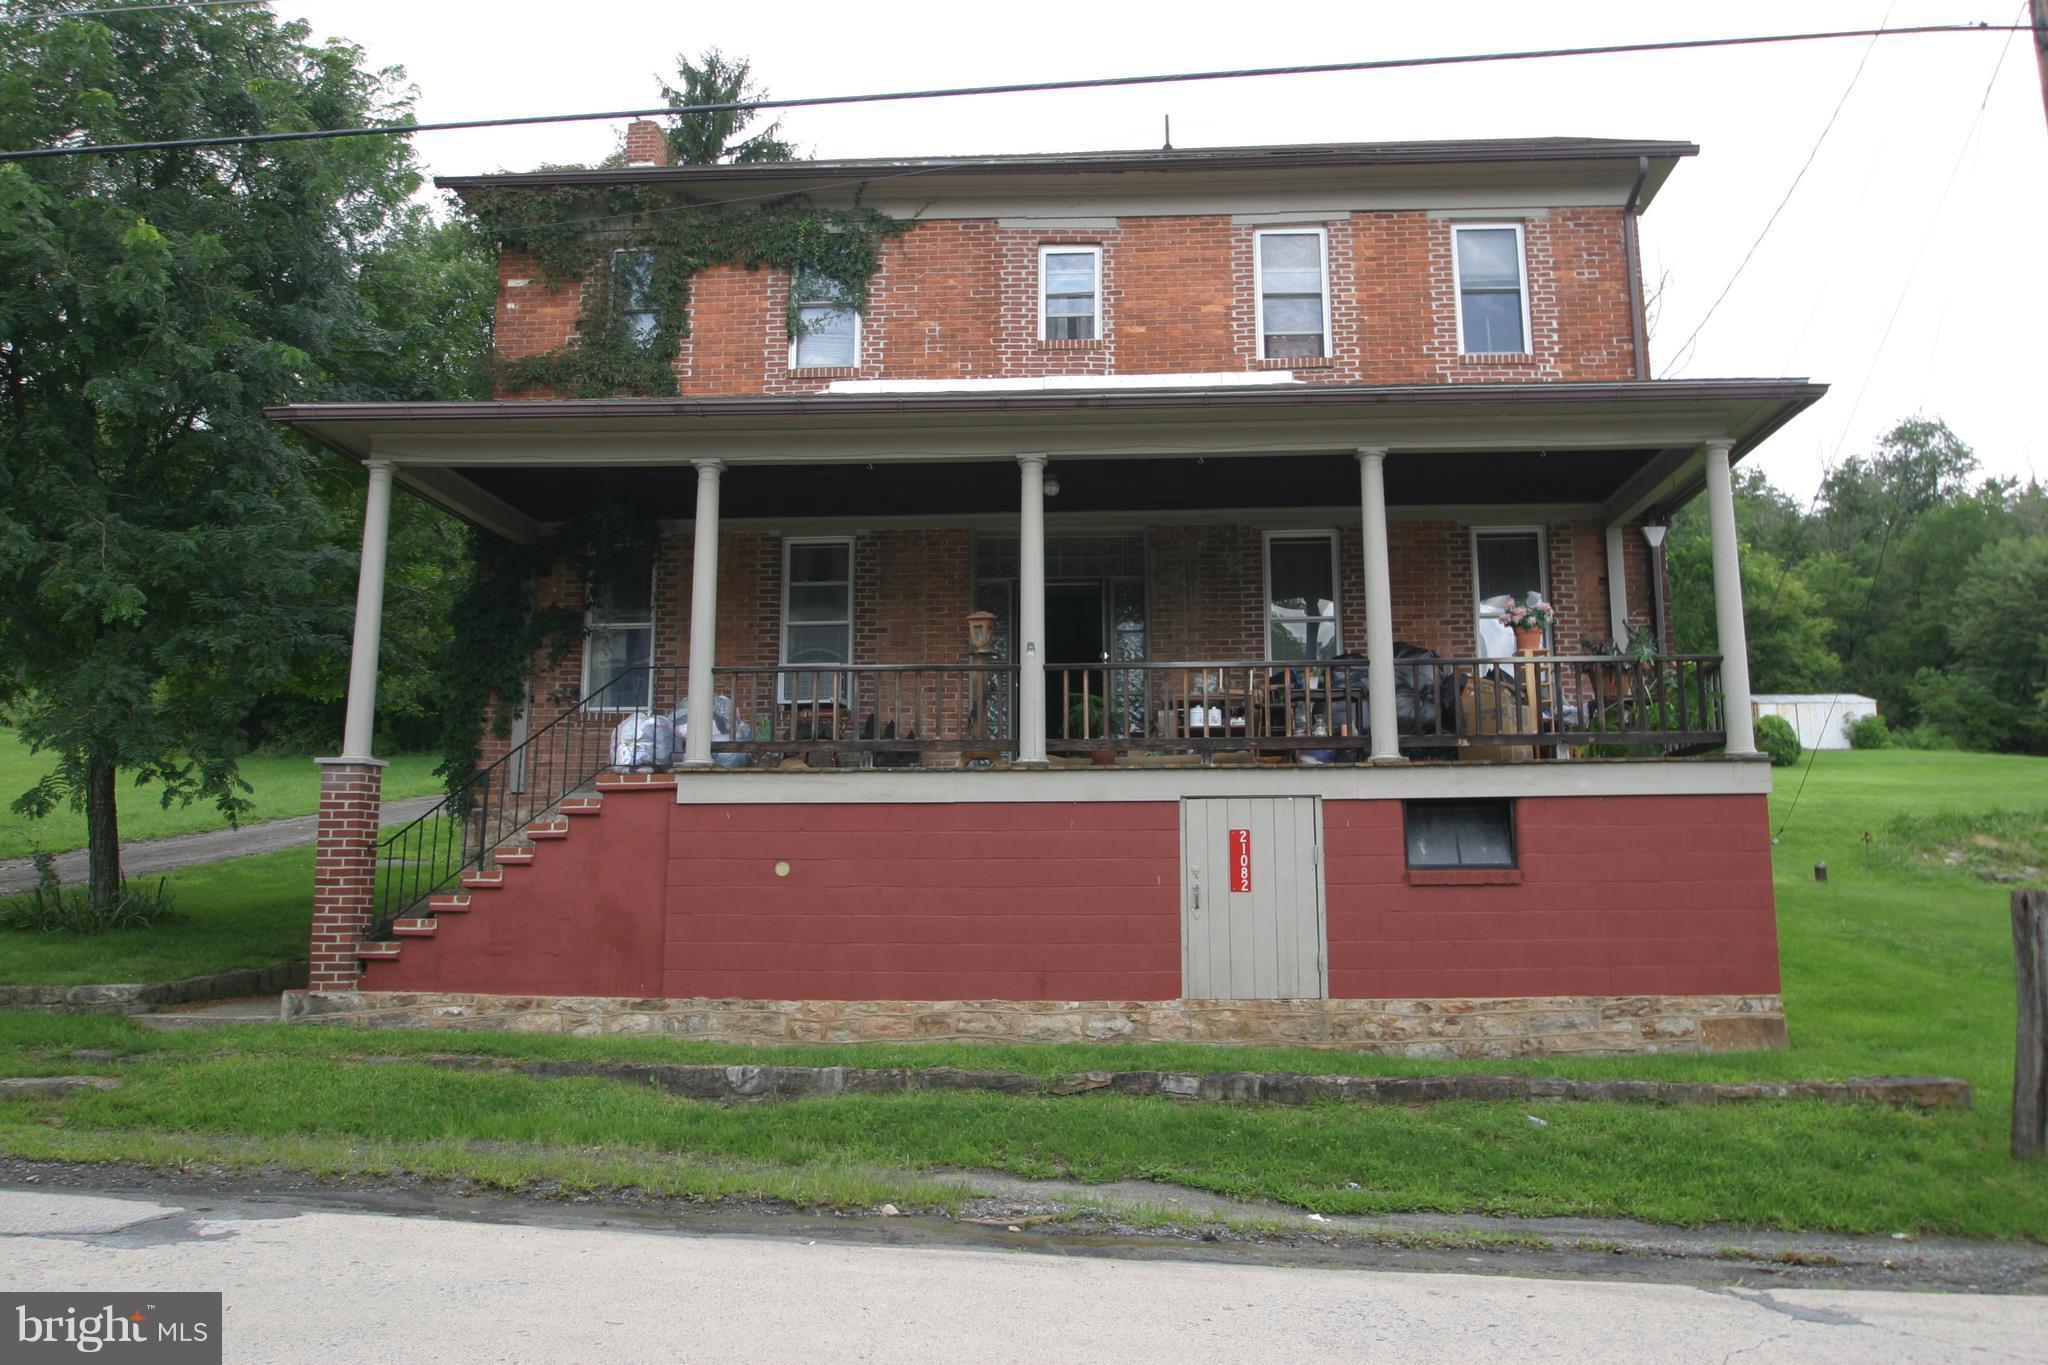 21082 MAIN STREET, SHADE GAP, PA 17255